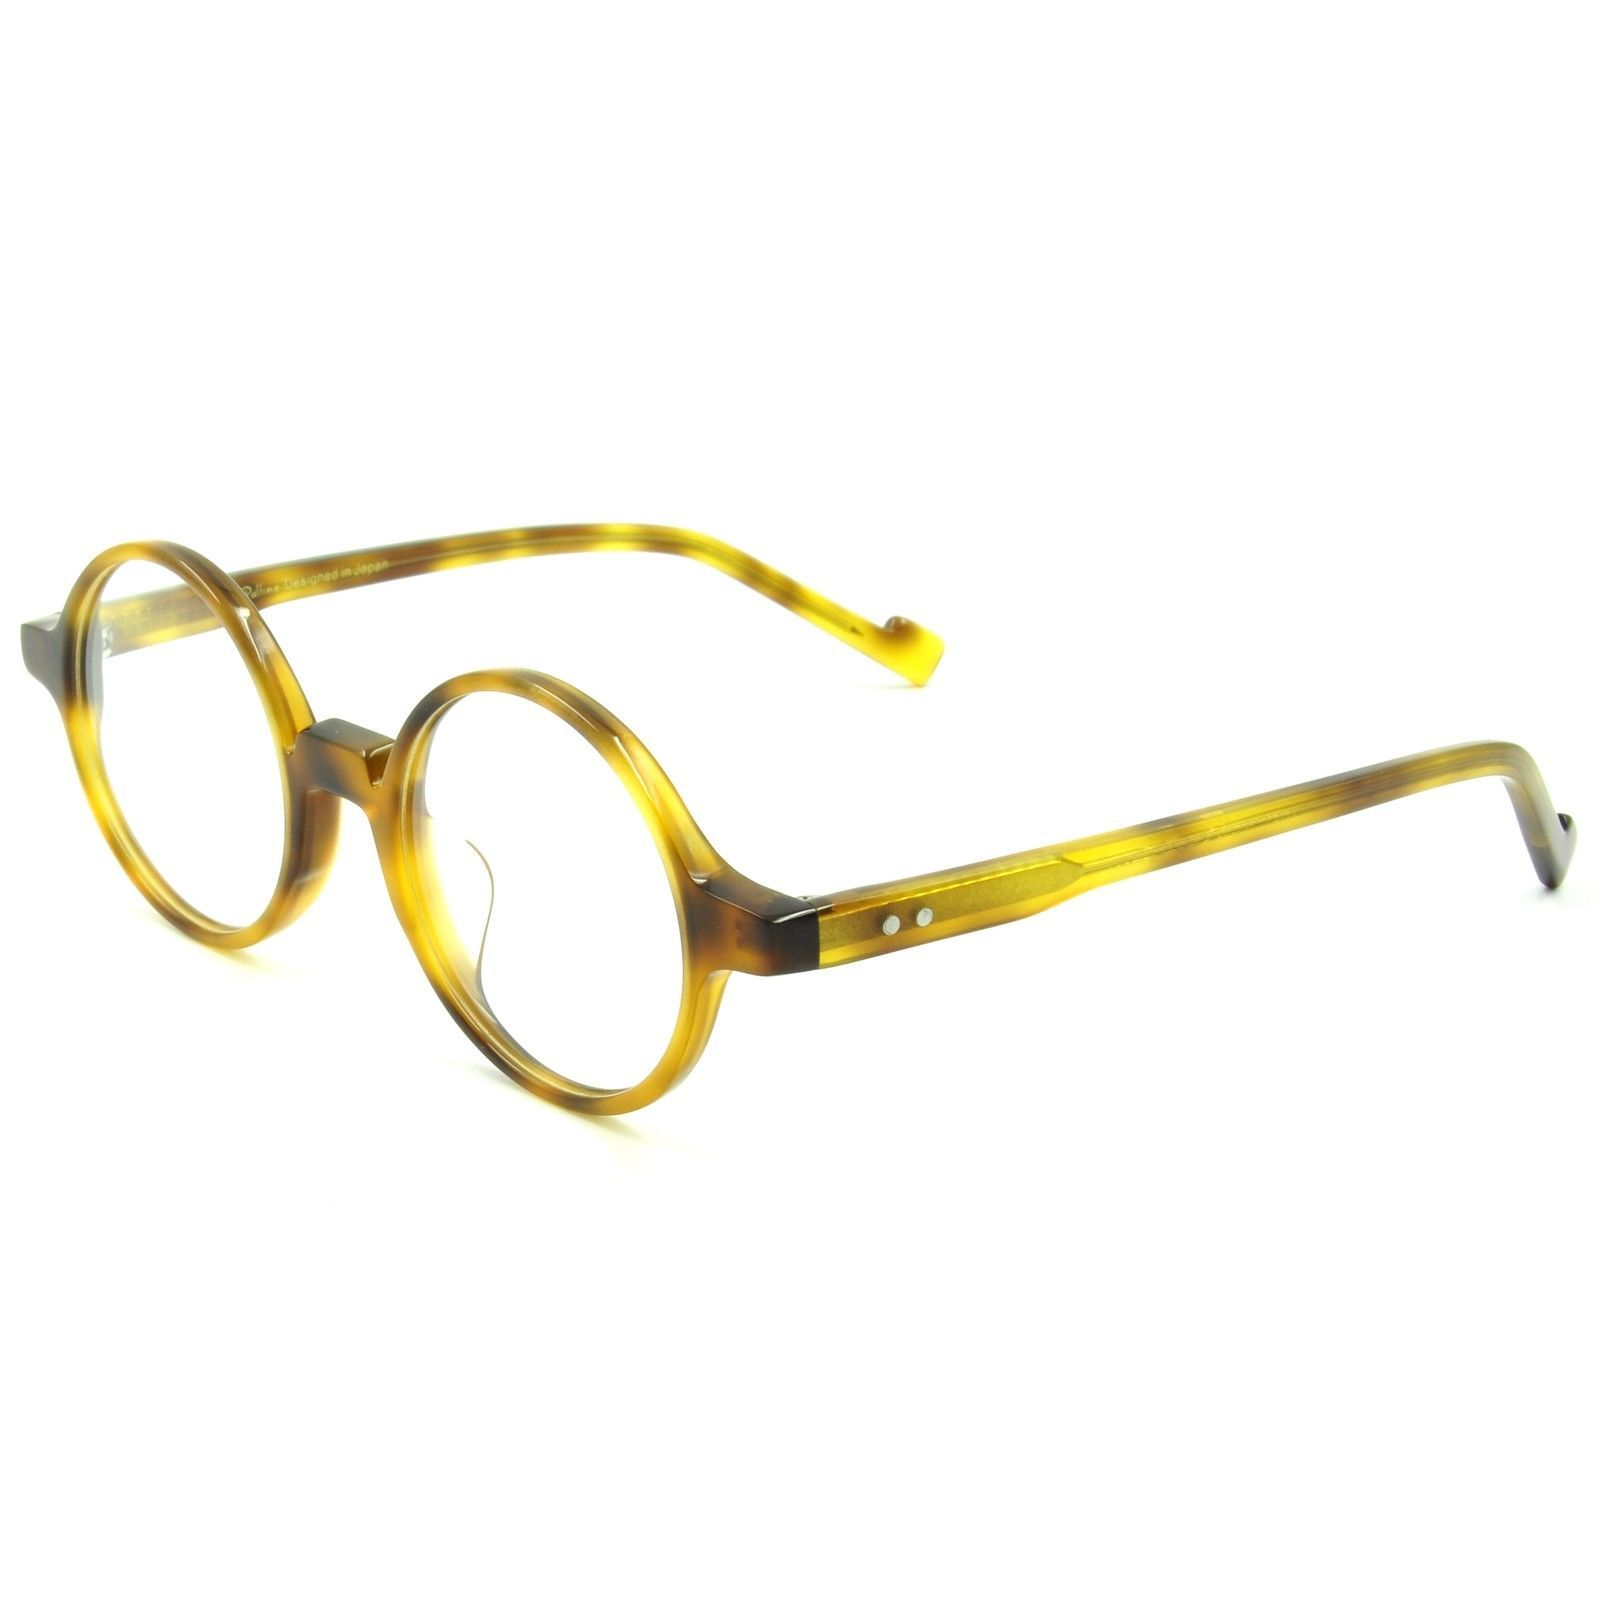 Vintage Round Circle Eyeglasses Frames John Lennon Glasses Retro Rx Spectacles